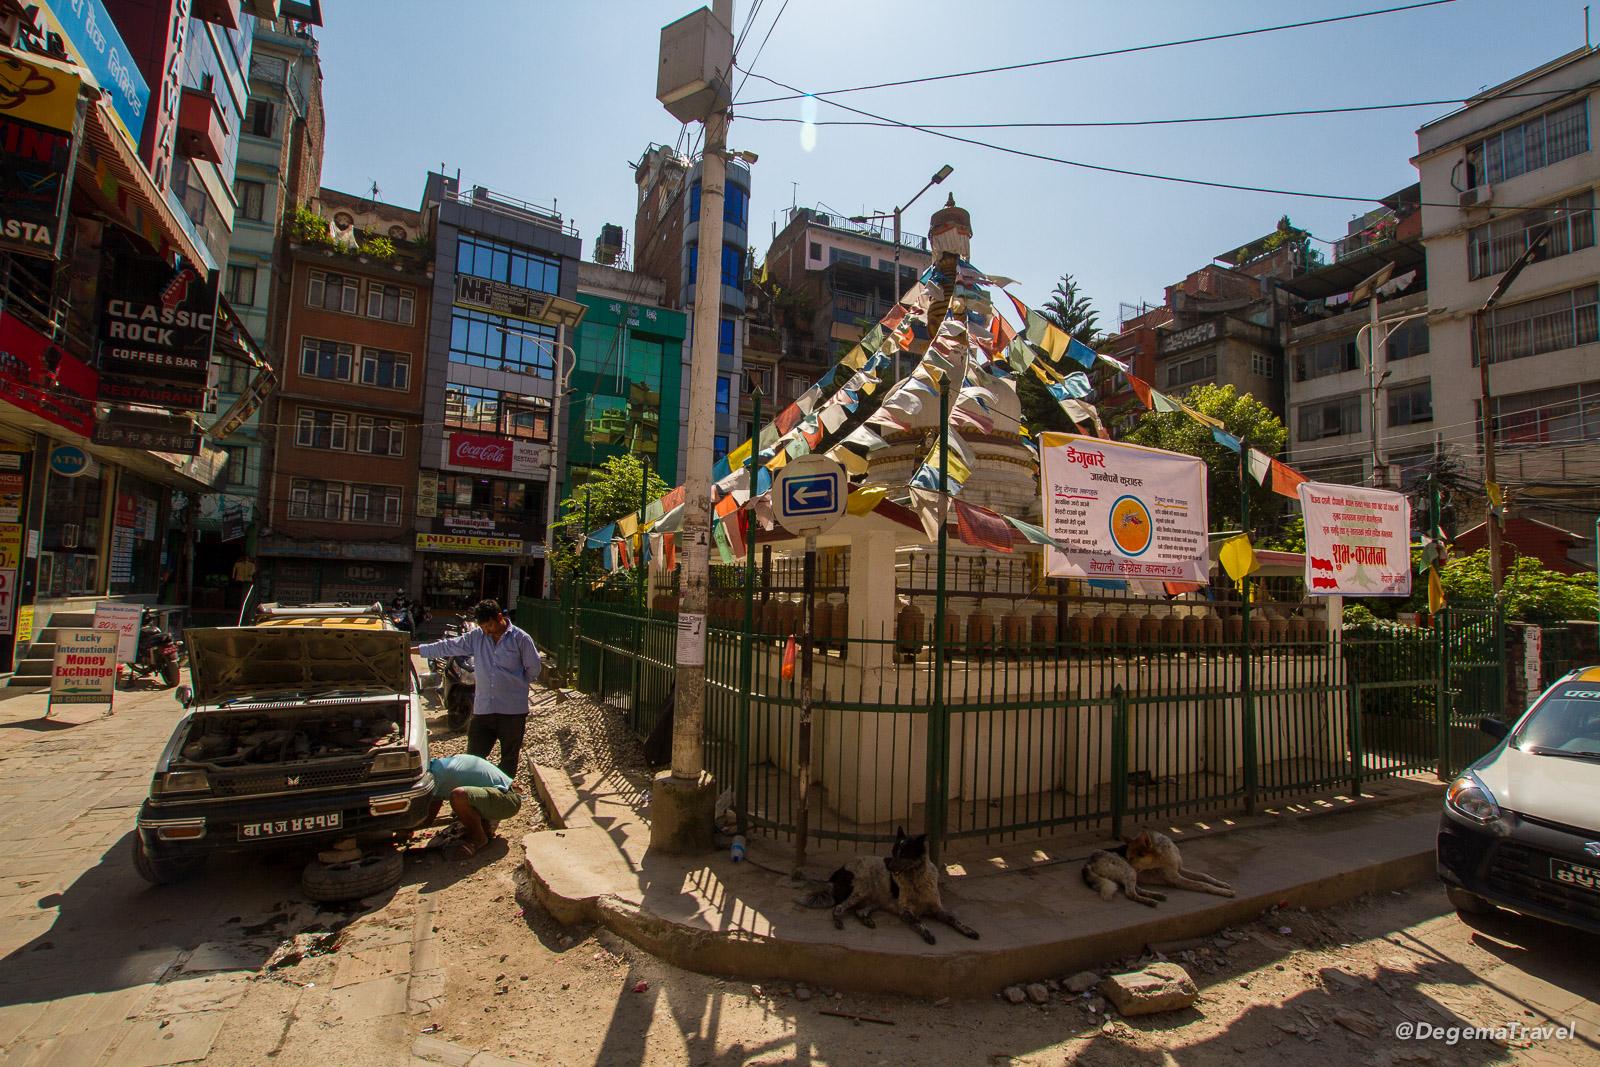 Part of Thamel in Kathmandu, Nepal